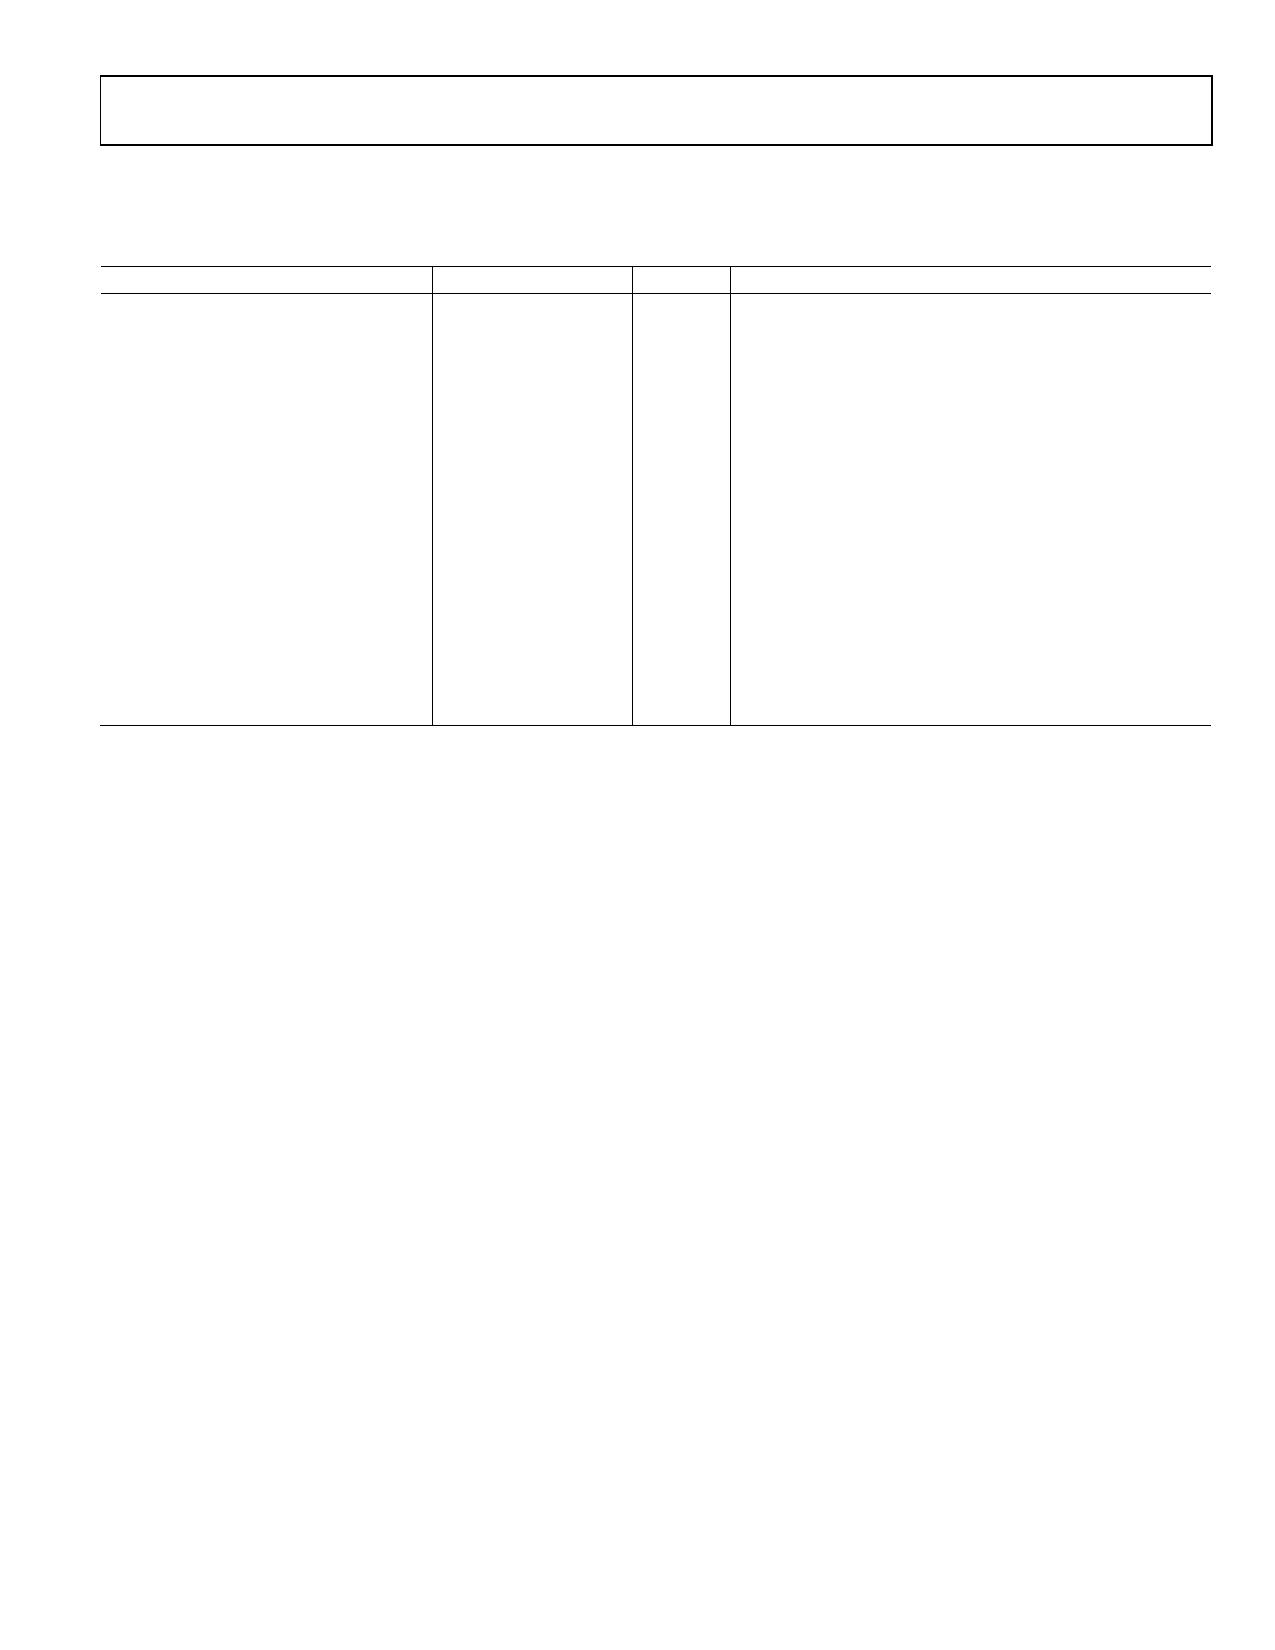 AD5667 pdf, arduino